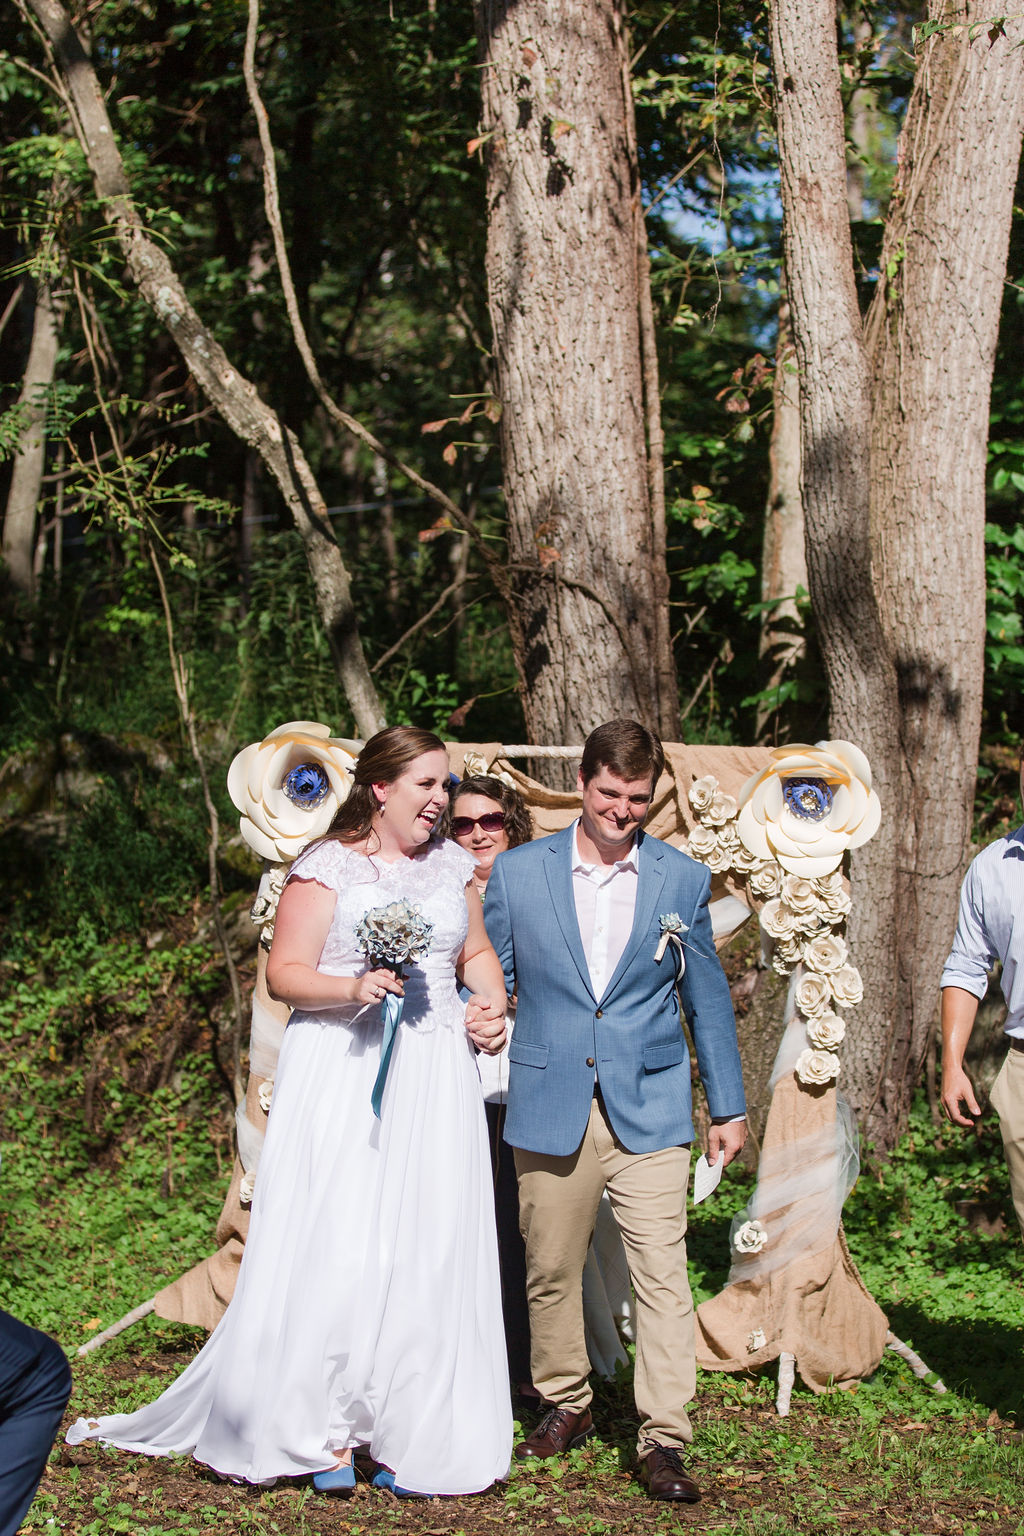 stackpole-ceremony-135.jpg